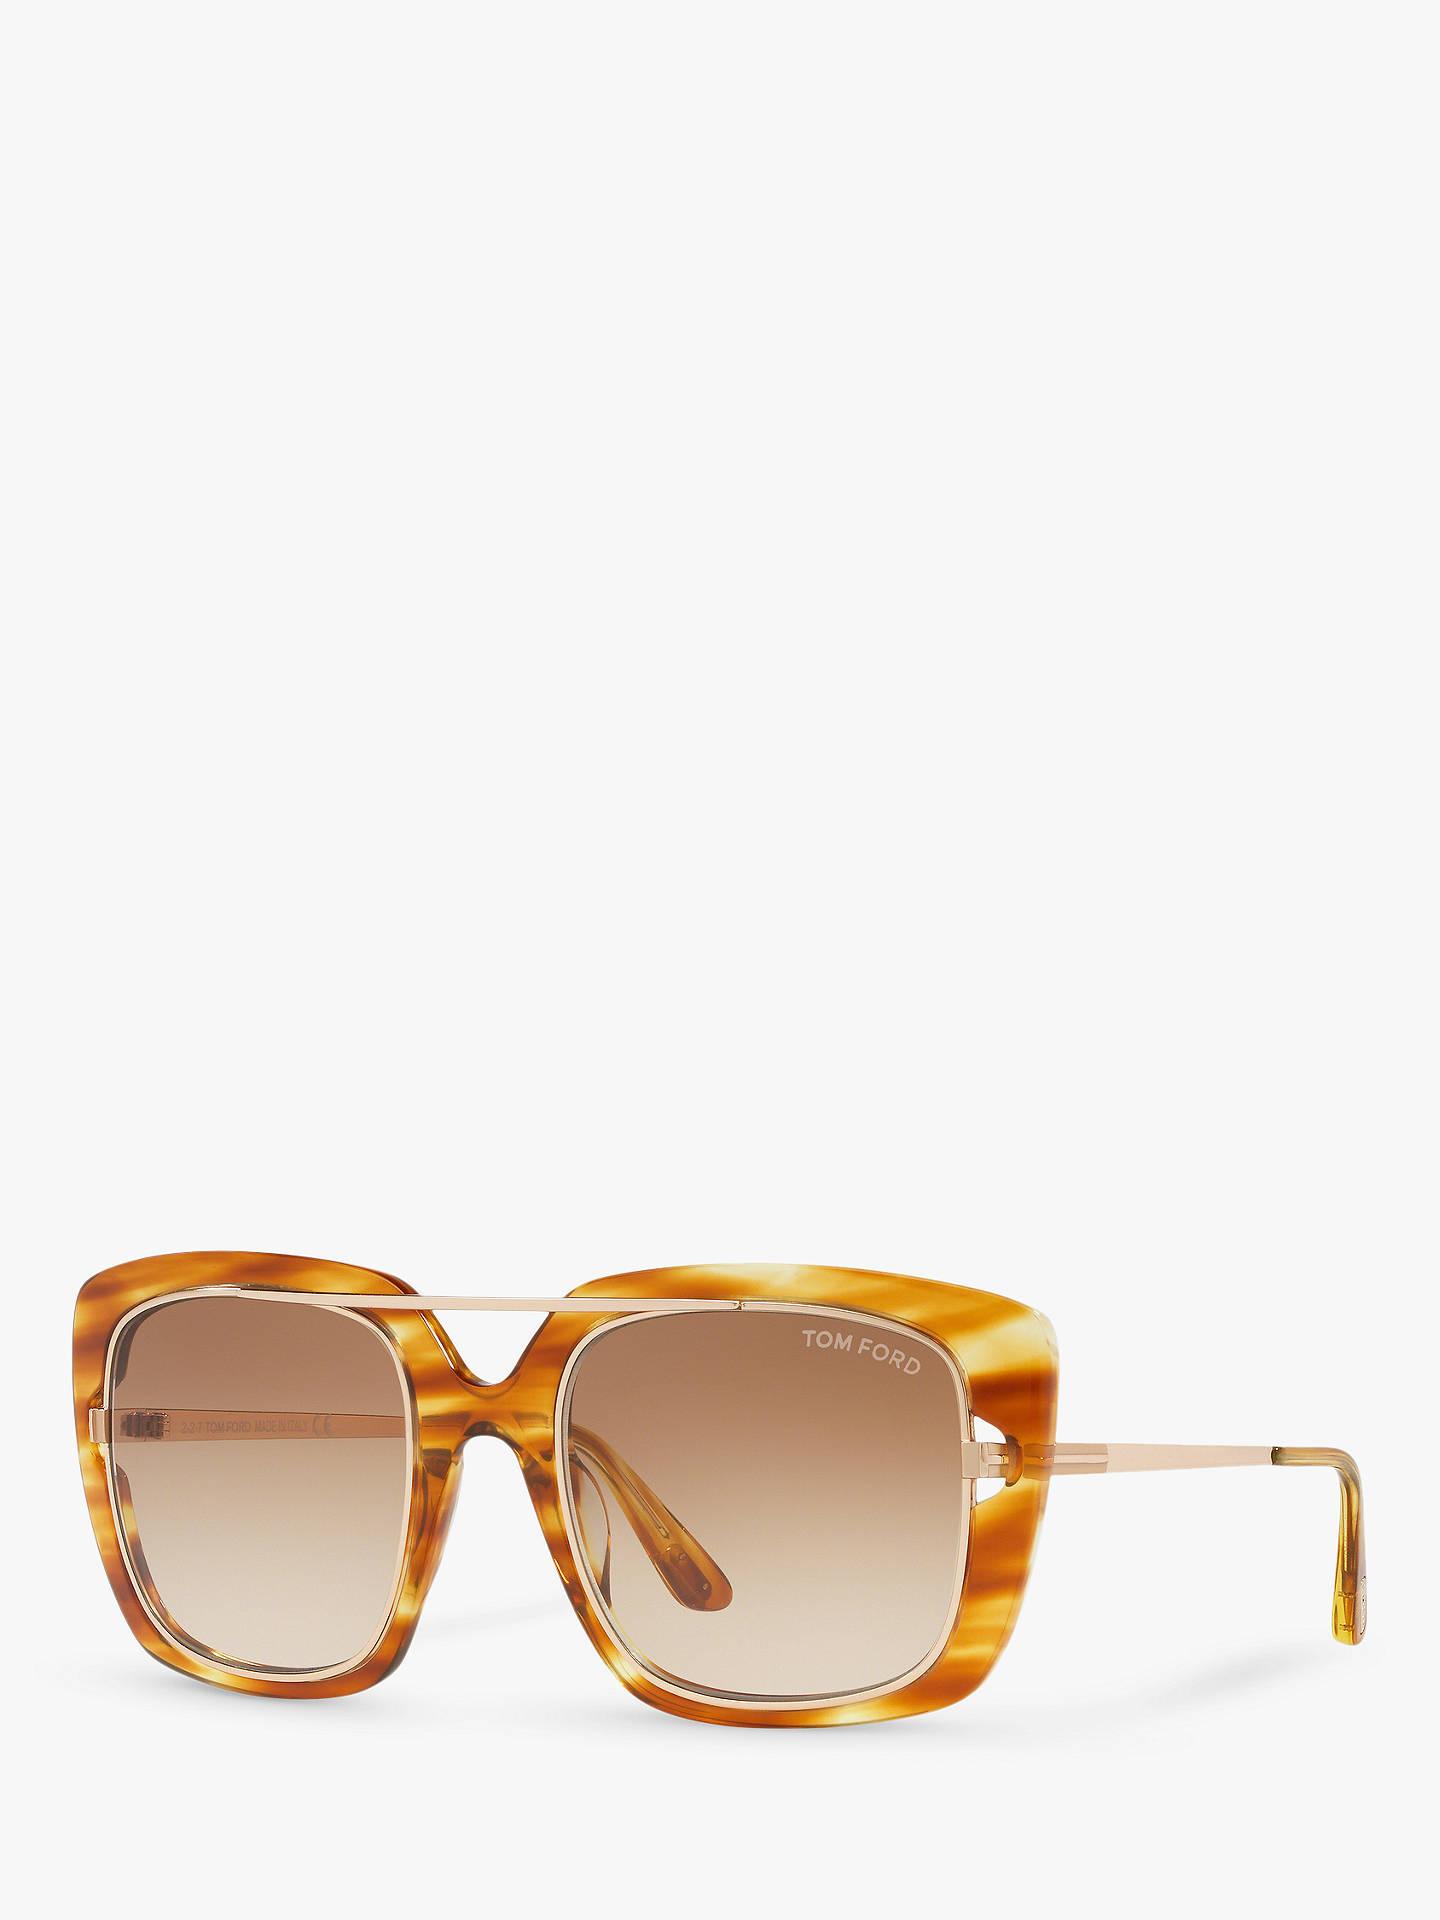 29f4e79c21 Buy TOM FORD FT0619 Unisex Marissa Square Sunglasses